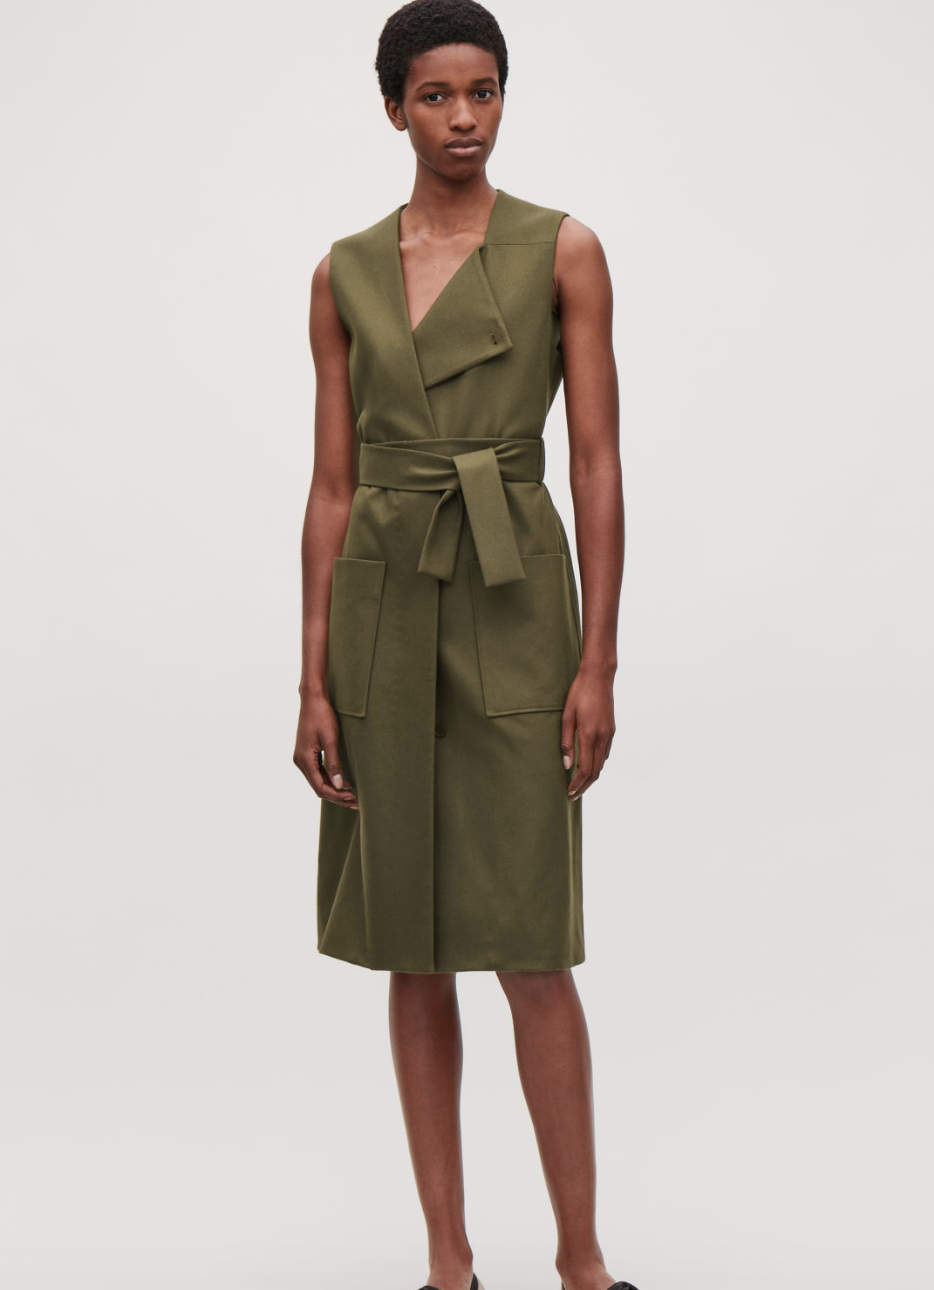 Cos, Dress, £115.00